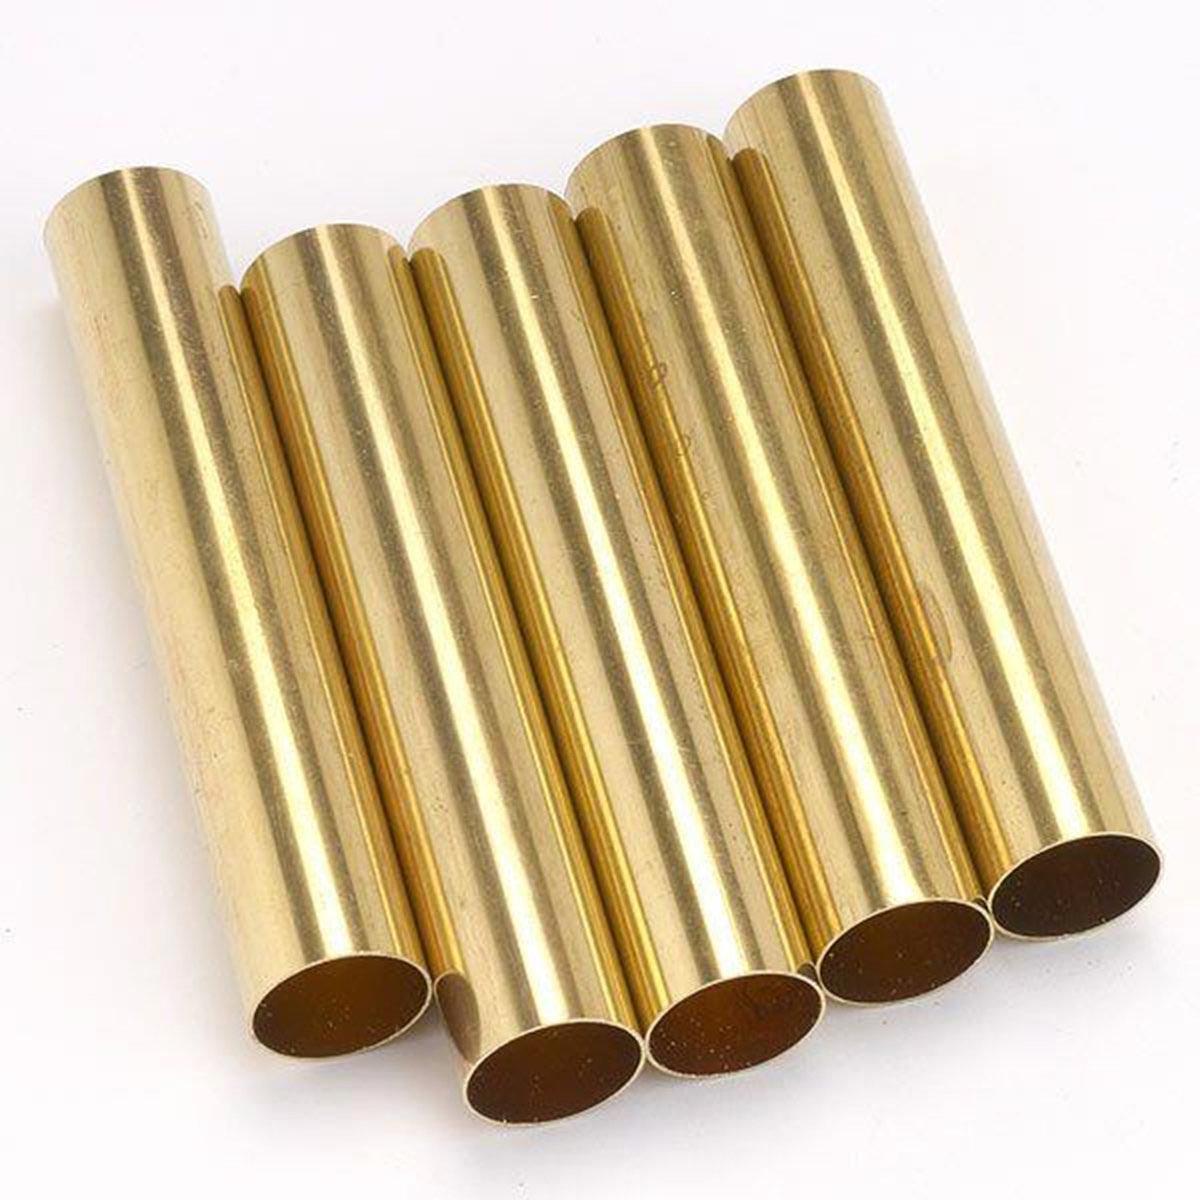 Replacement Tubes for Enterprise Ballpoint Pen Kit 5-Piece